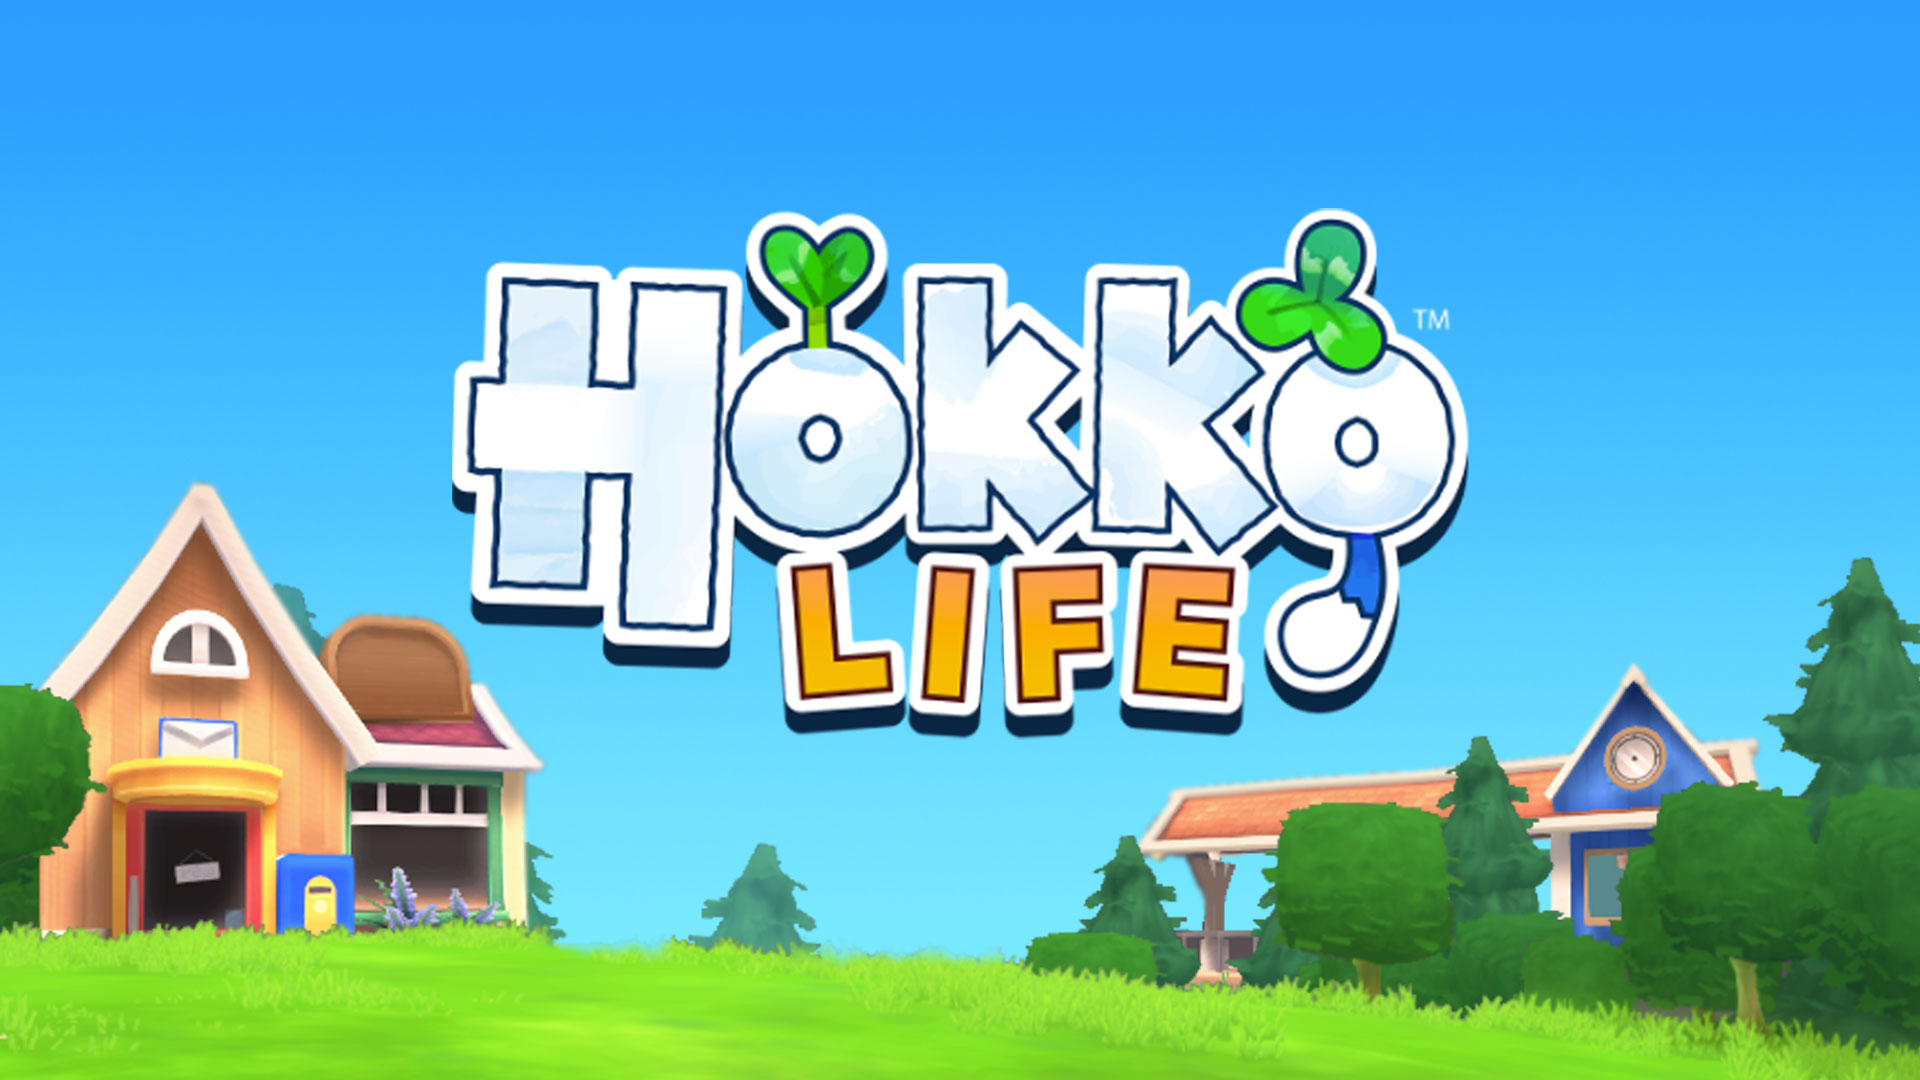 Introducing Hokko Life!